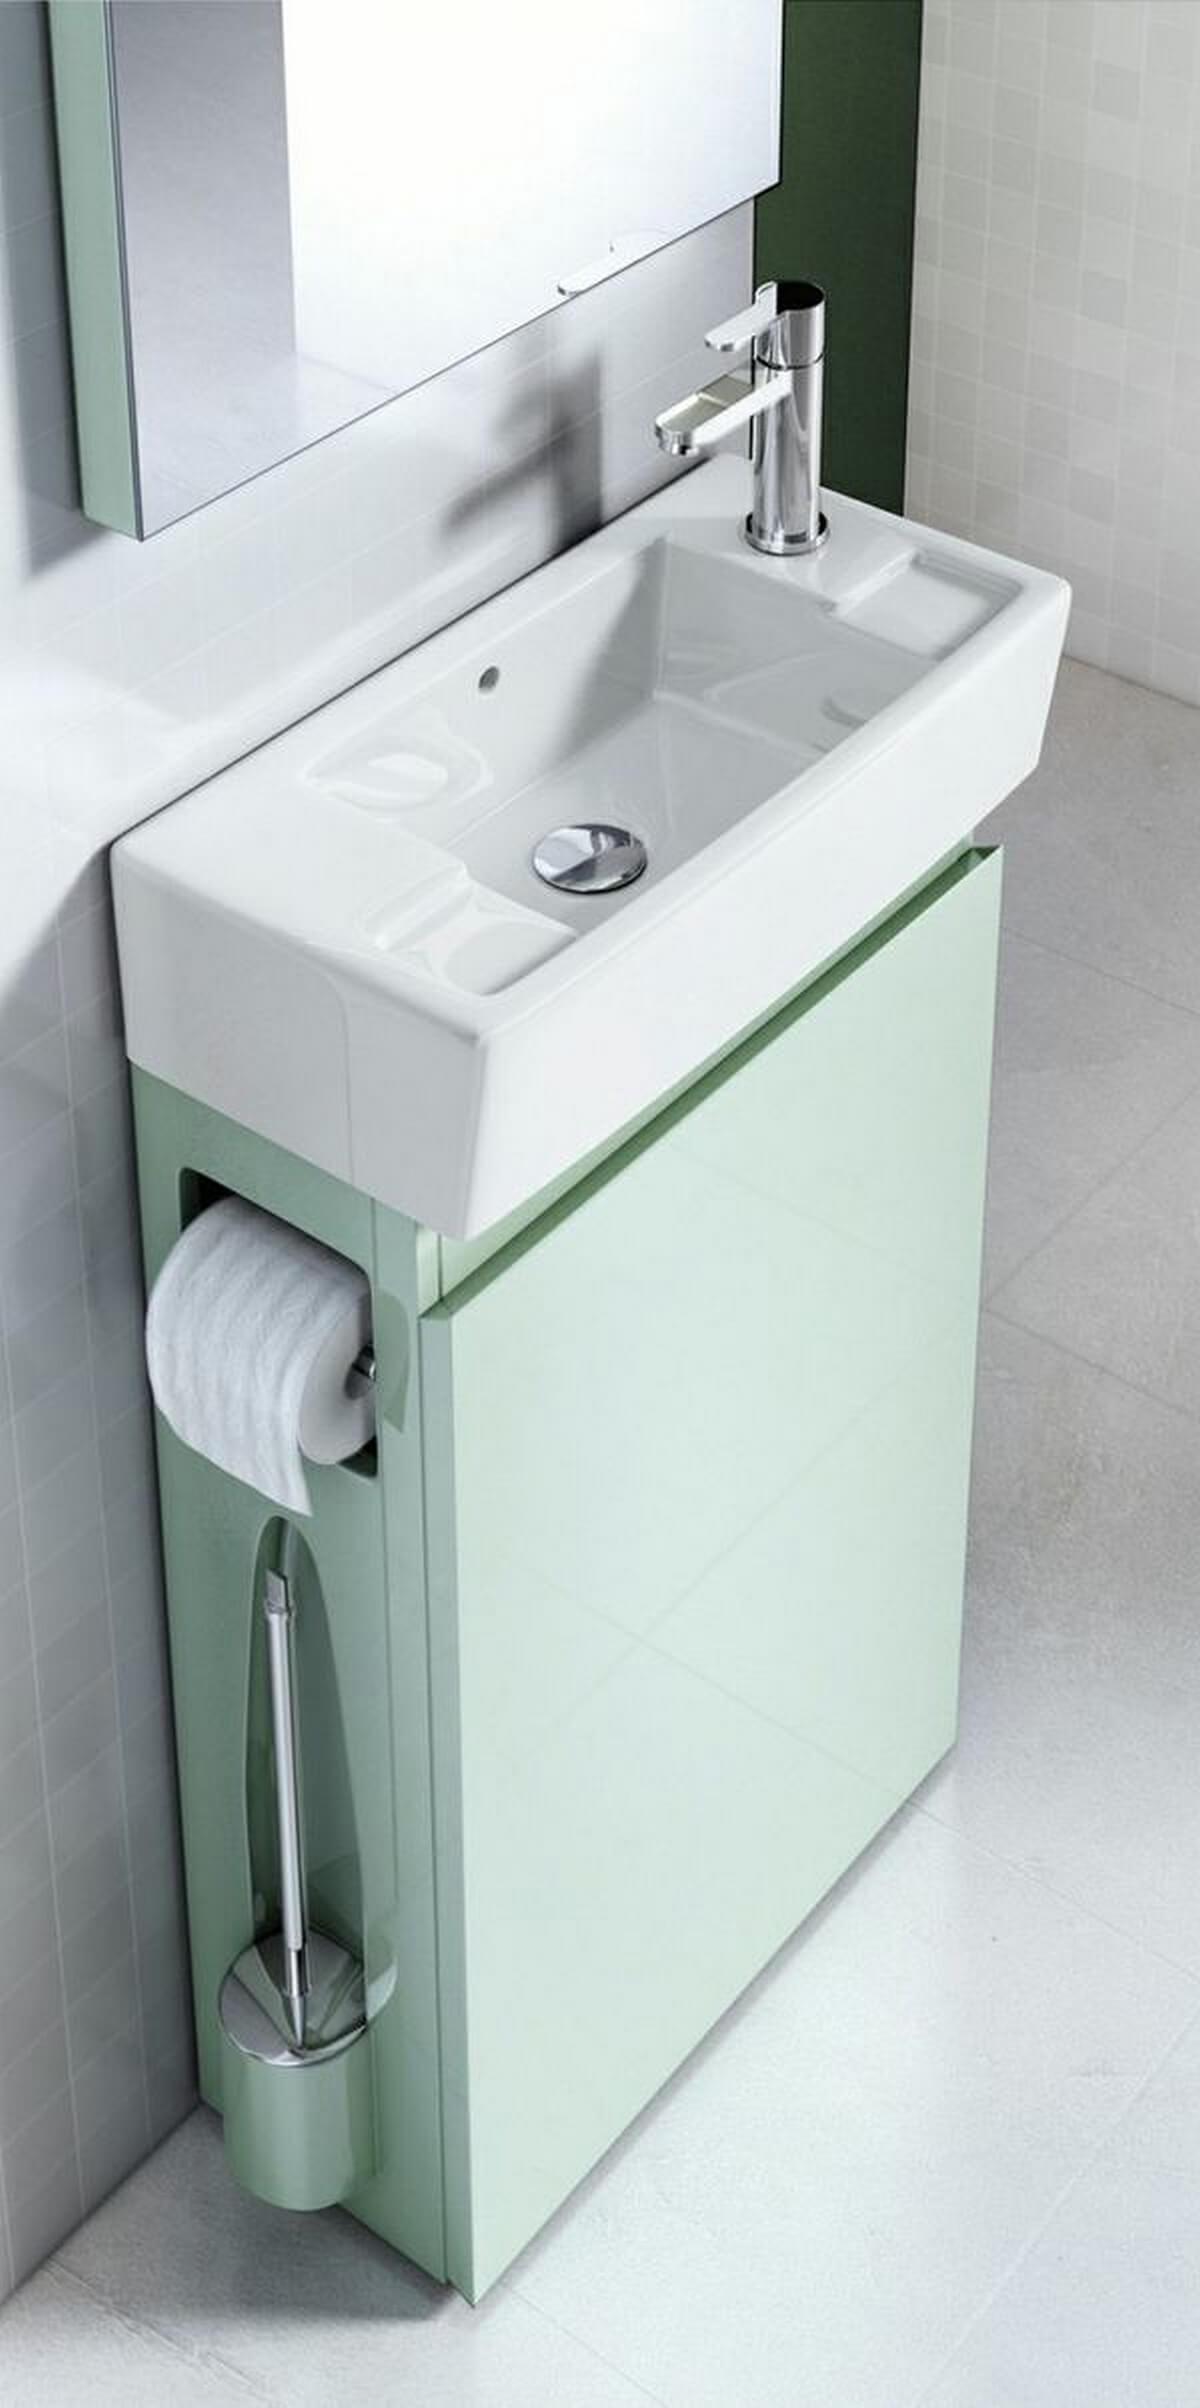 18-small-bathroom-storage-ideas-homebnc